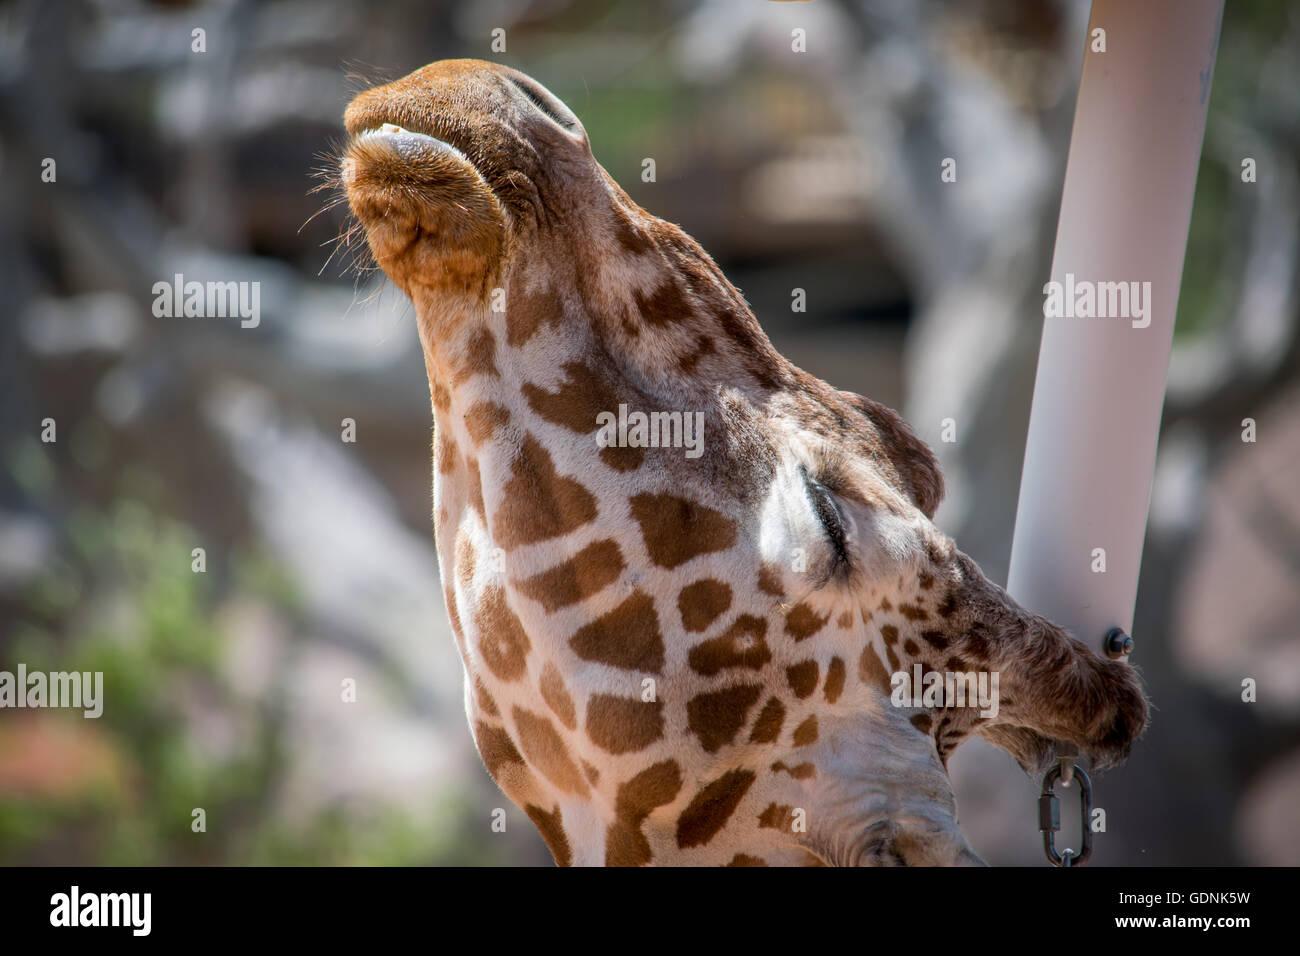 Giraffe basking in the sunshine - Stock Image